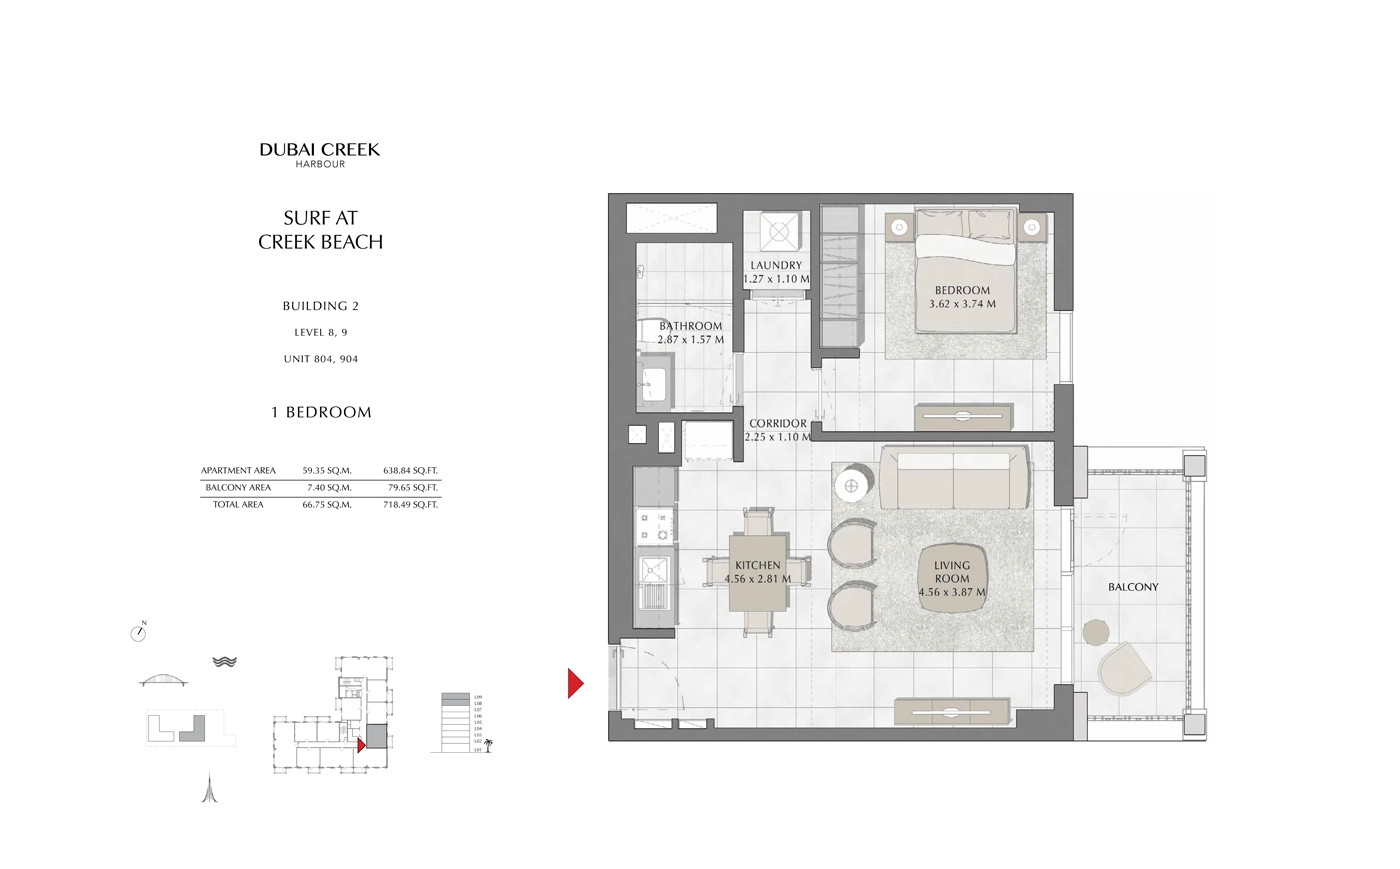 Building 2, 1 Bedroom Level 8, 9, Size 718 Sq Ft